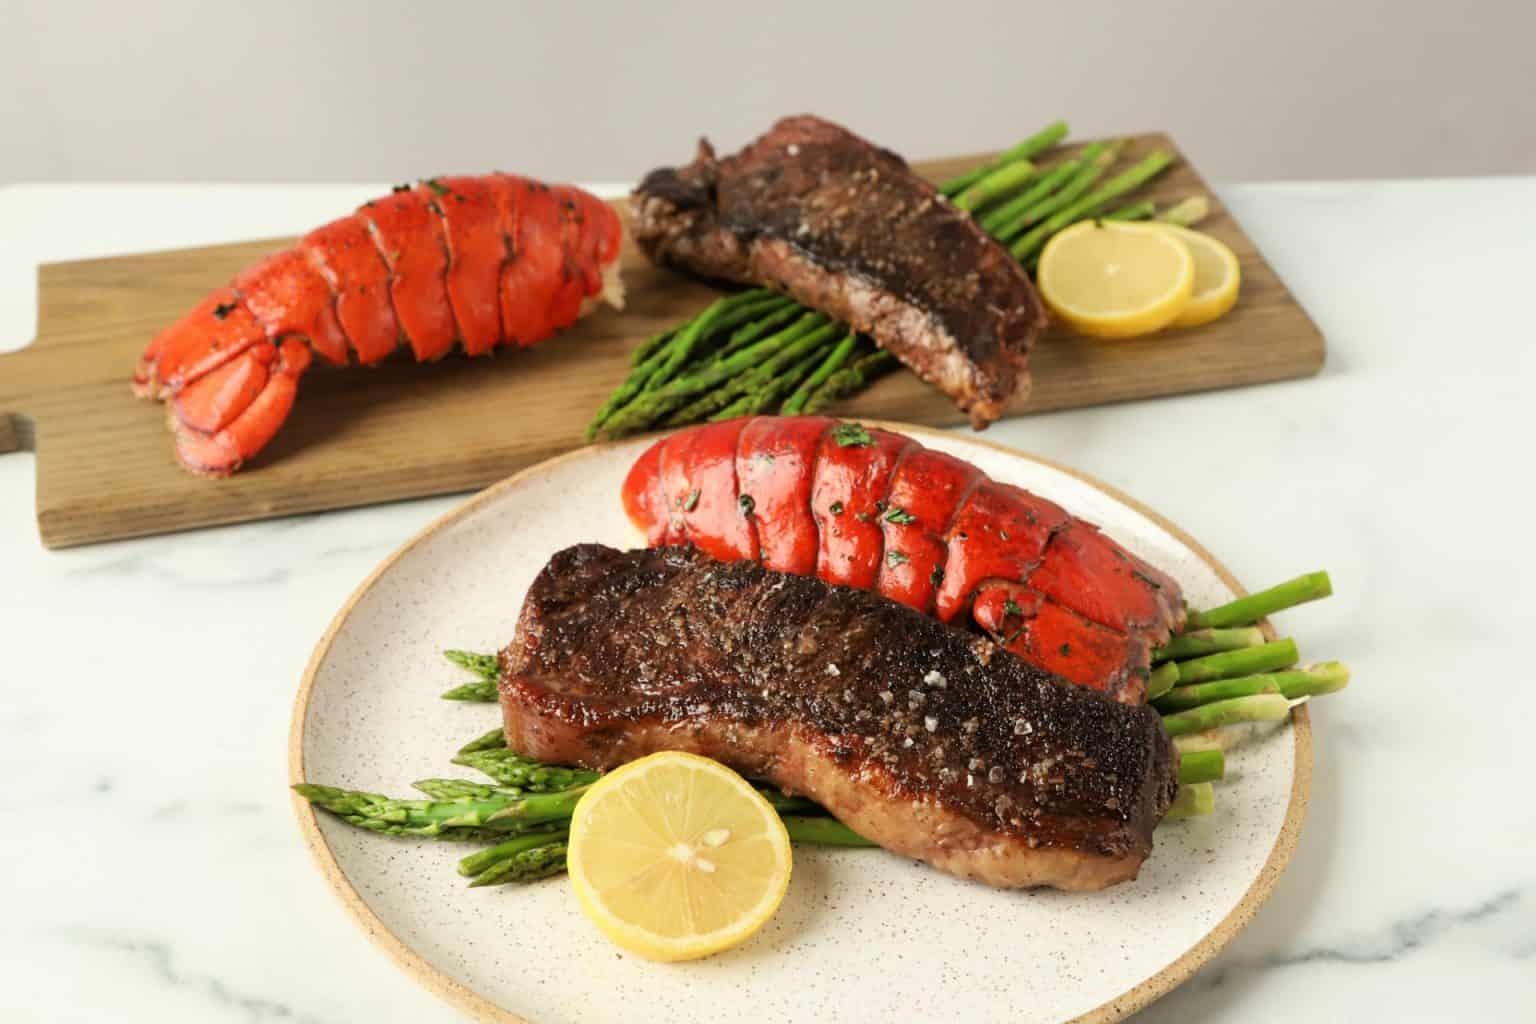 Steak-Lobster Surf and Turf